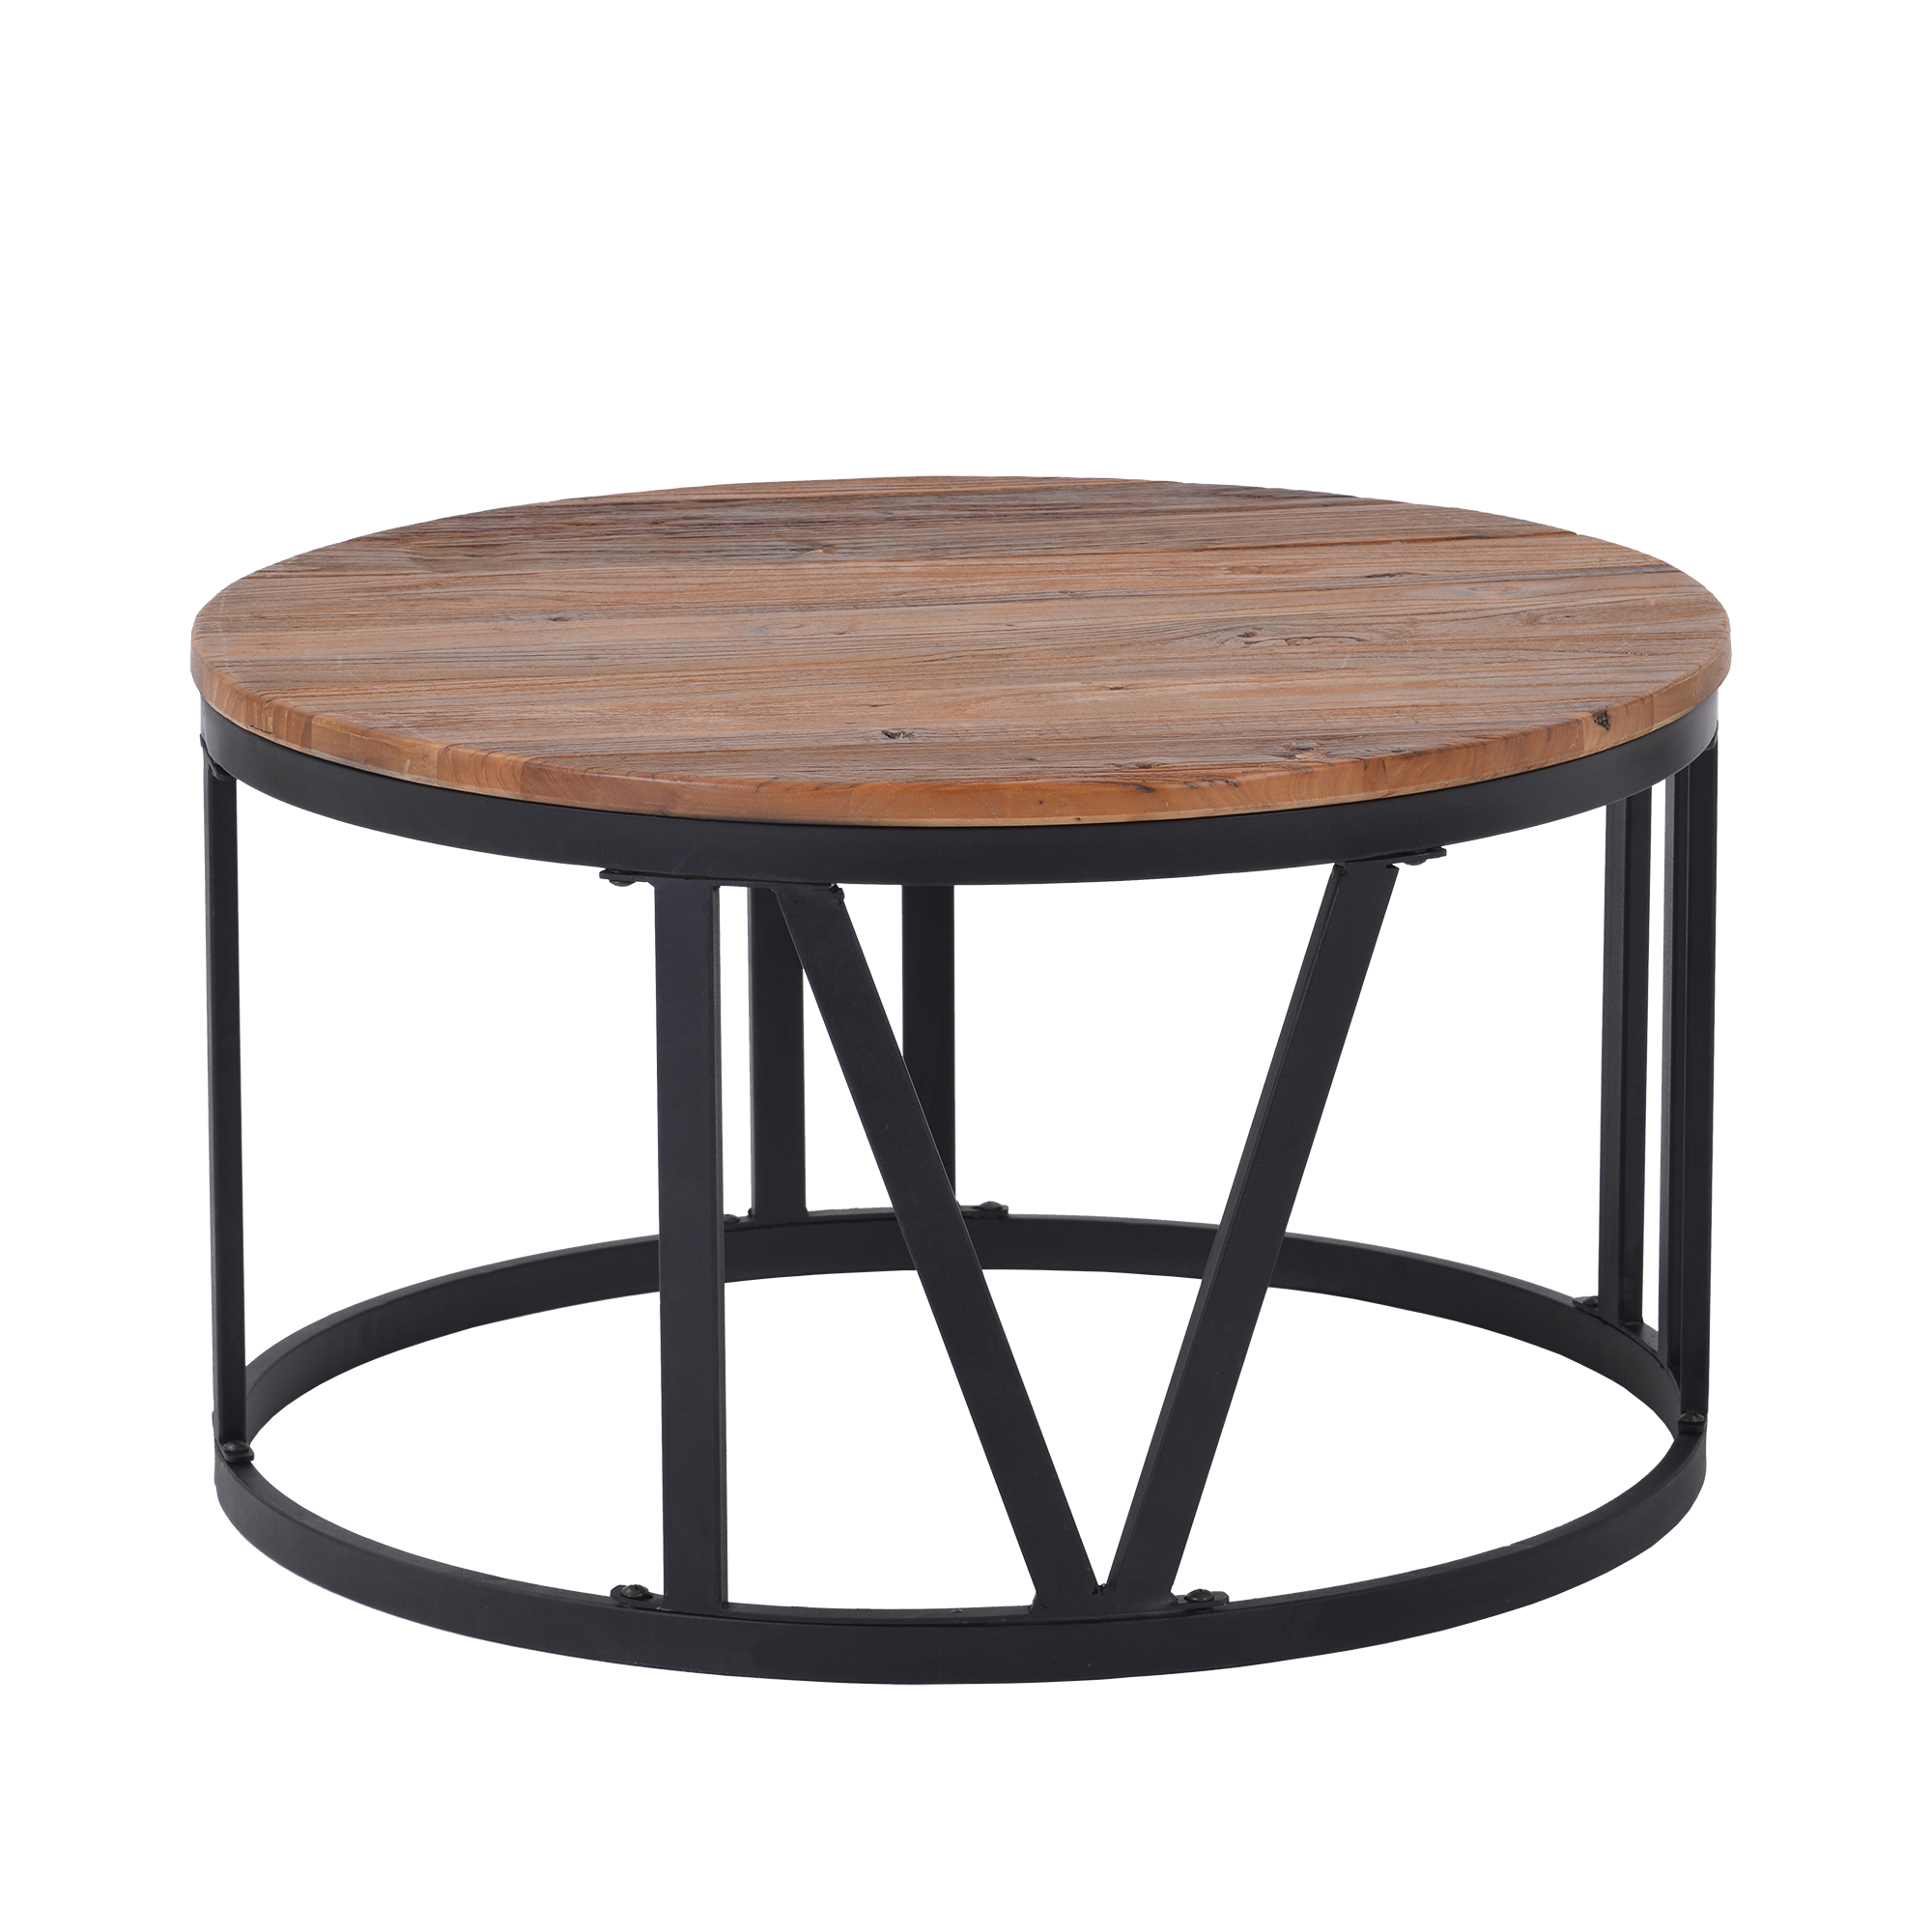 rustic coffee table old elm wood desktop with roman numerically shaped iron legs o31 5 walmart com